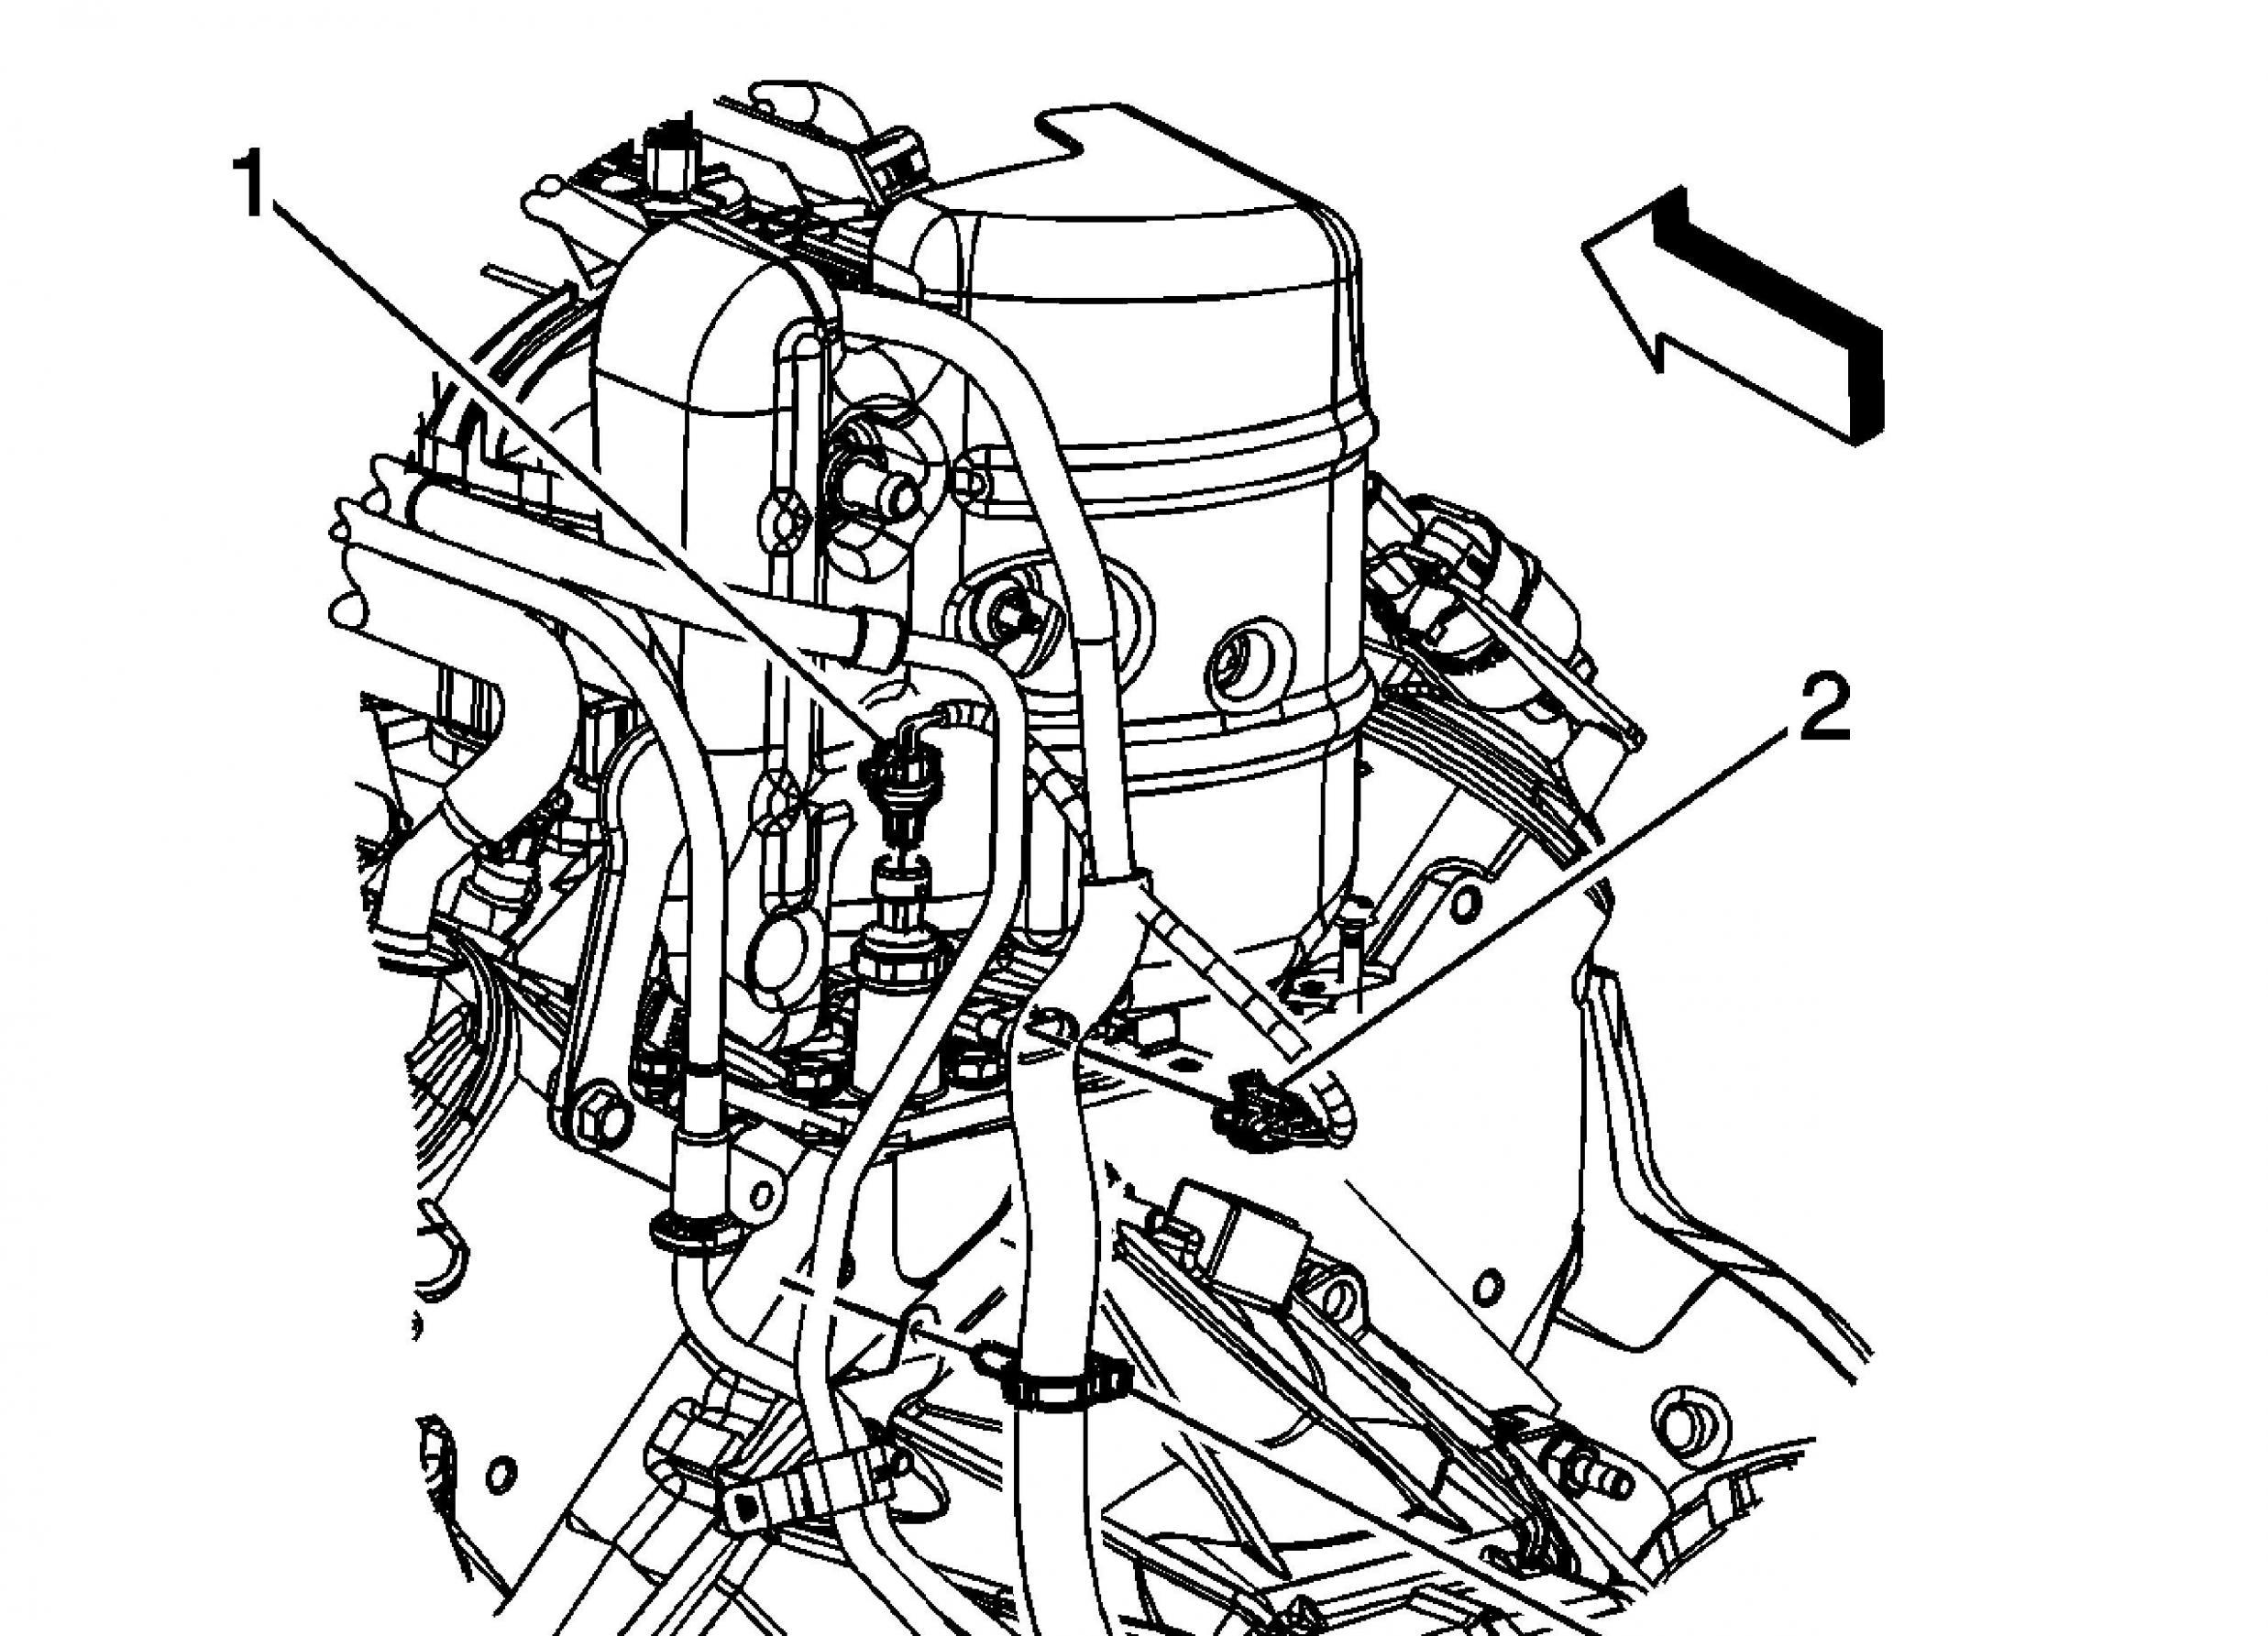 Oil Pressure Sensor Location, Oil, Free Engine Image For